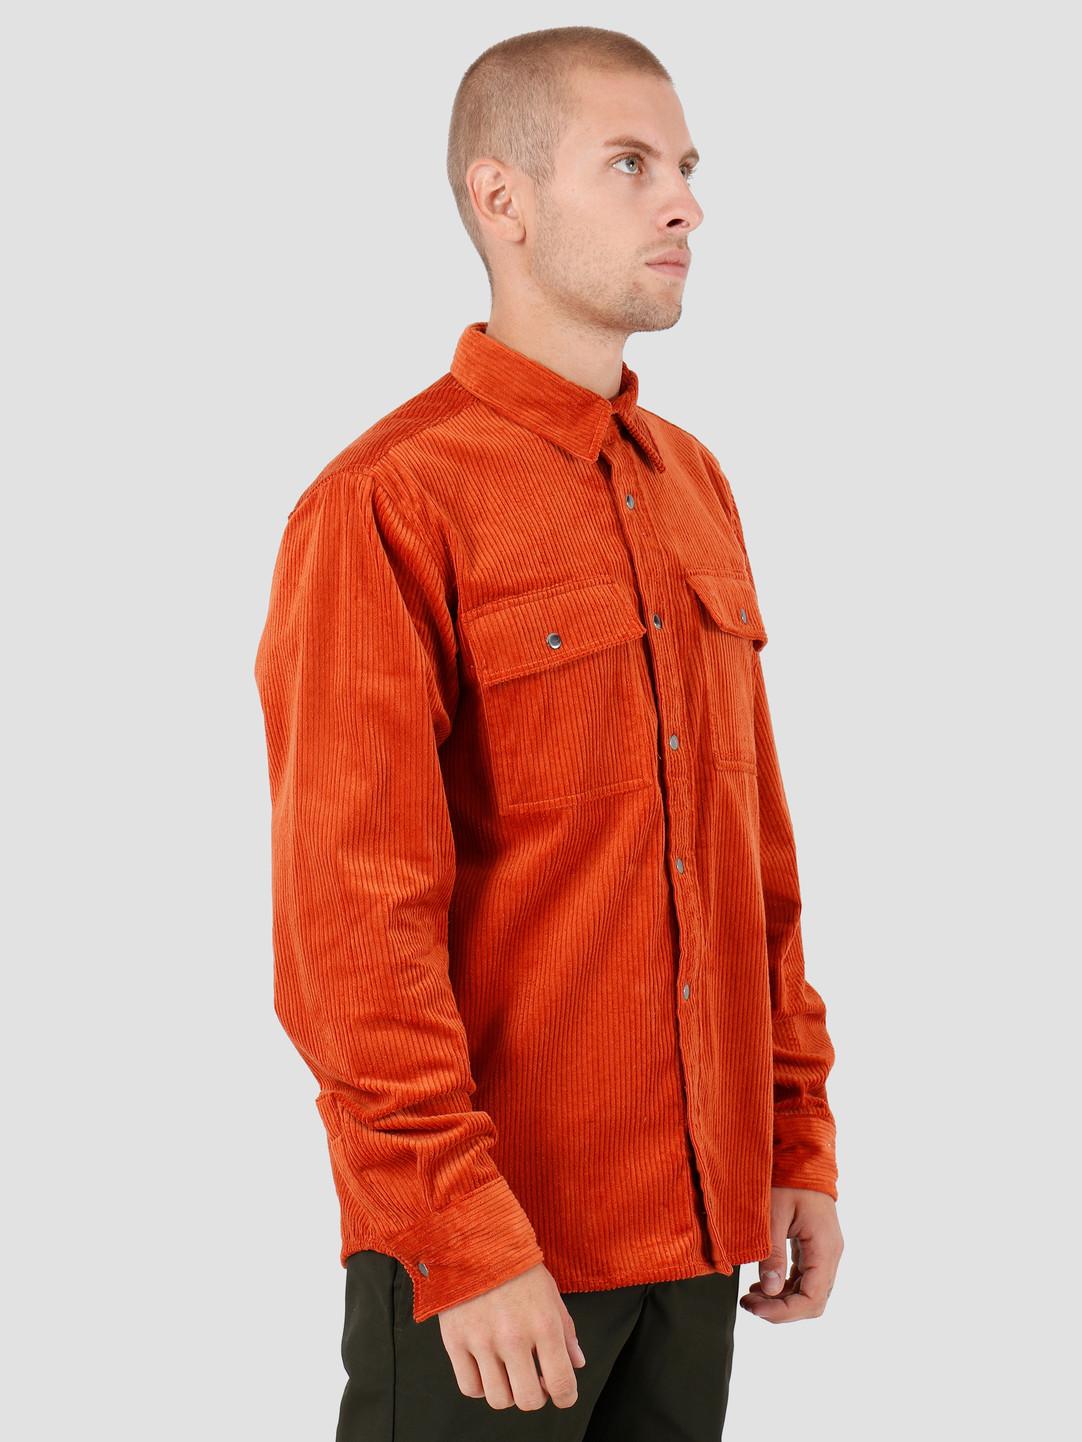 Dickies Dickies Ivel Shirt Rust DK520357RUS1